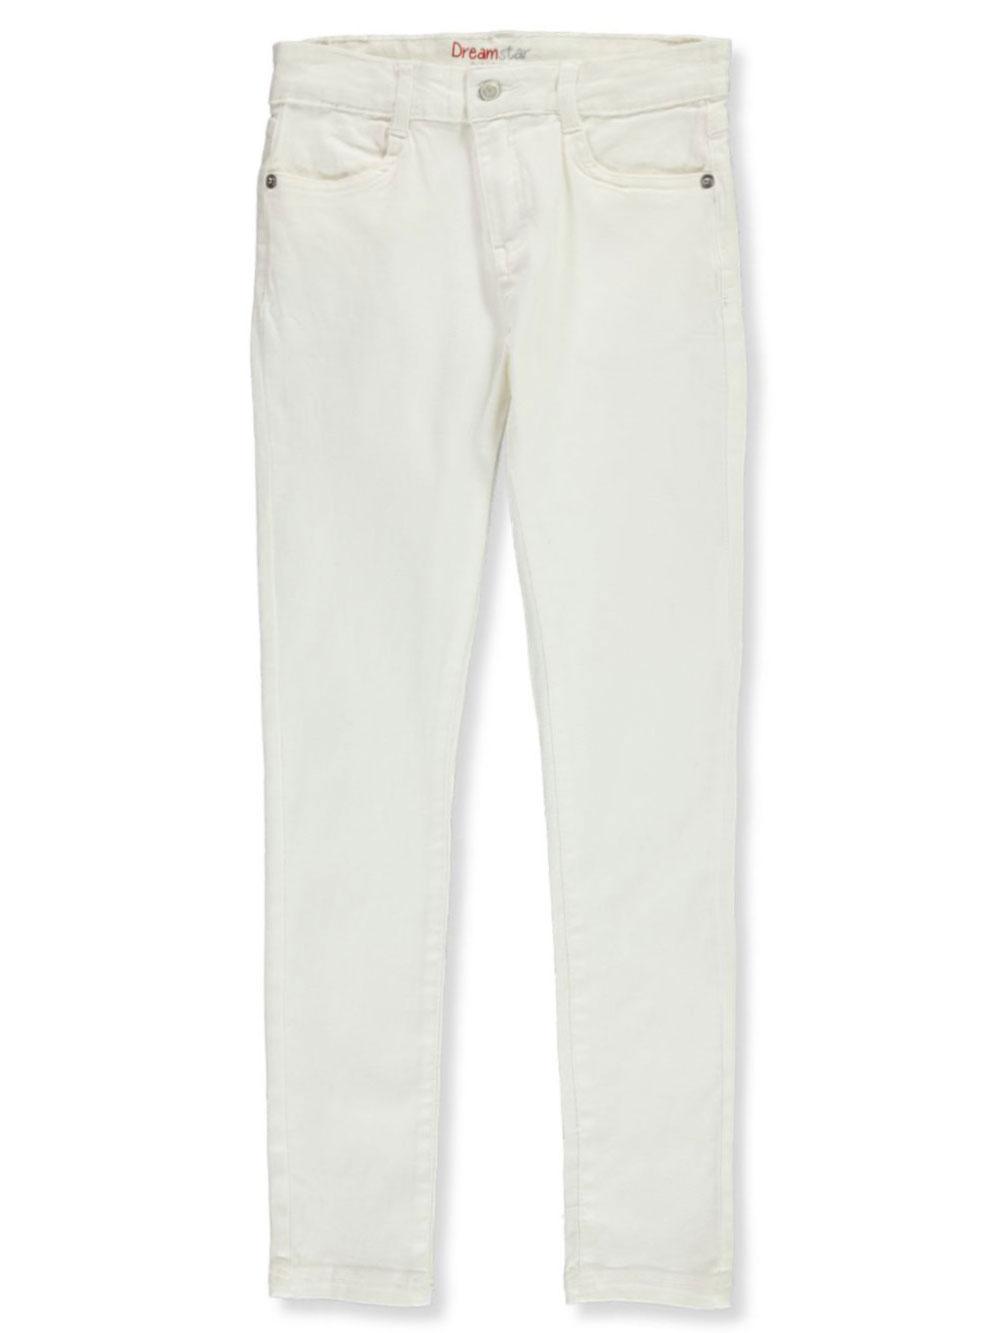 Dream Star Girls Stretch Twill Jeans